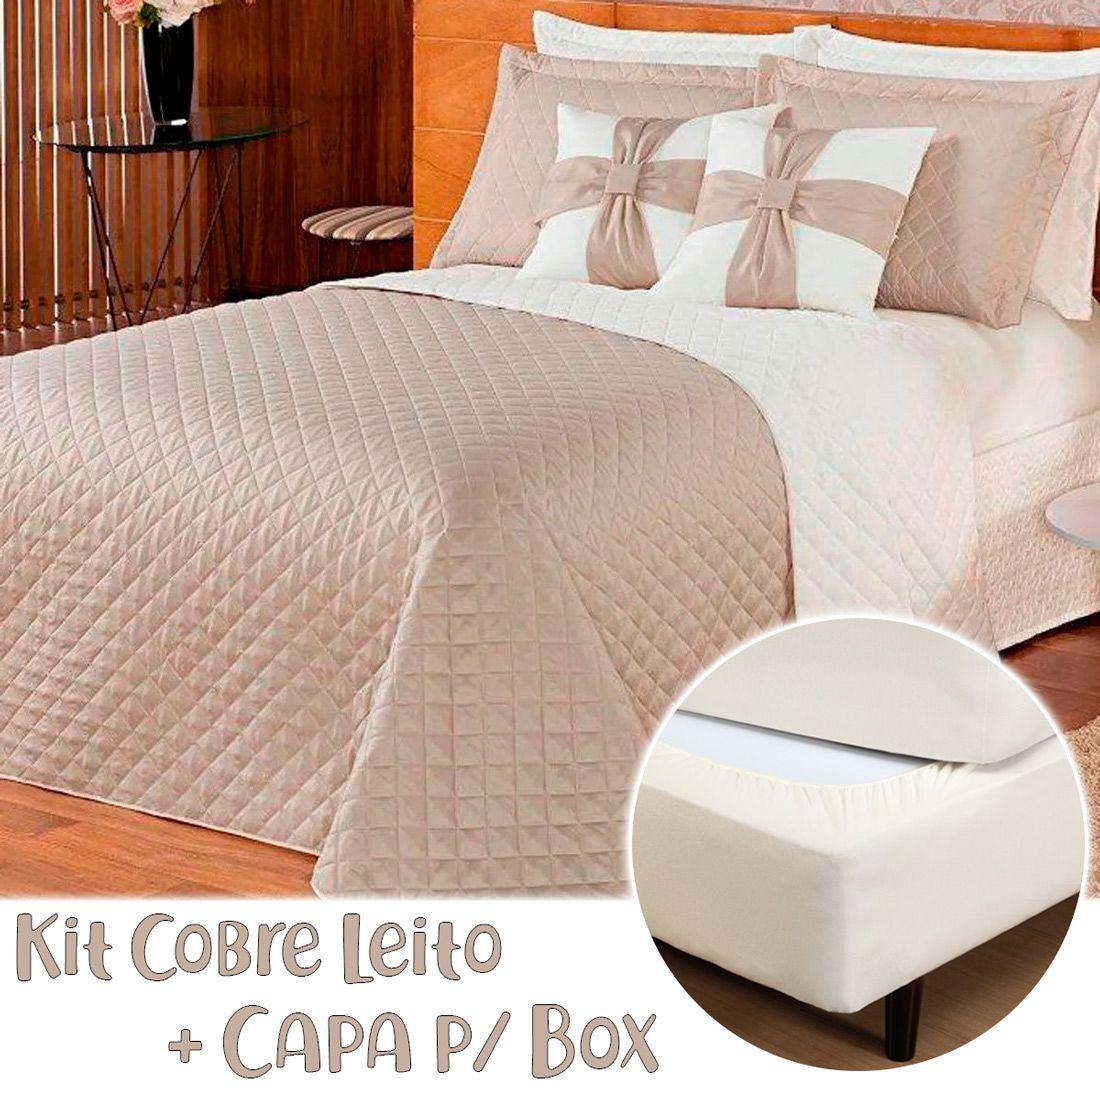 Kit Combo Cobre Leito + Capa p/ Box Ruth Caqui/Palha Casal 08 Peças